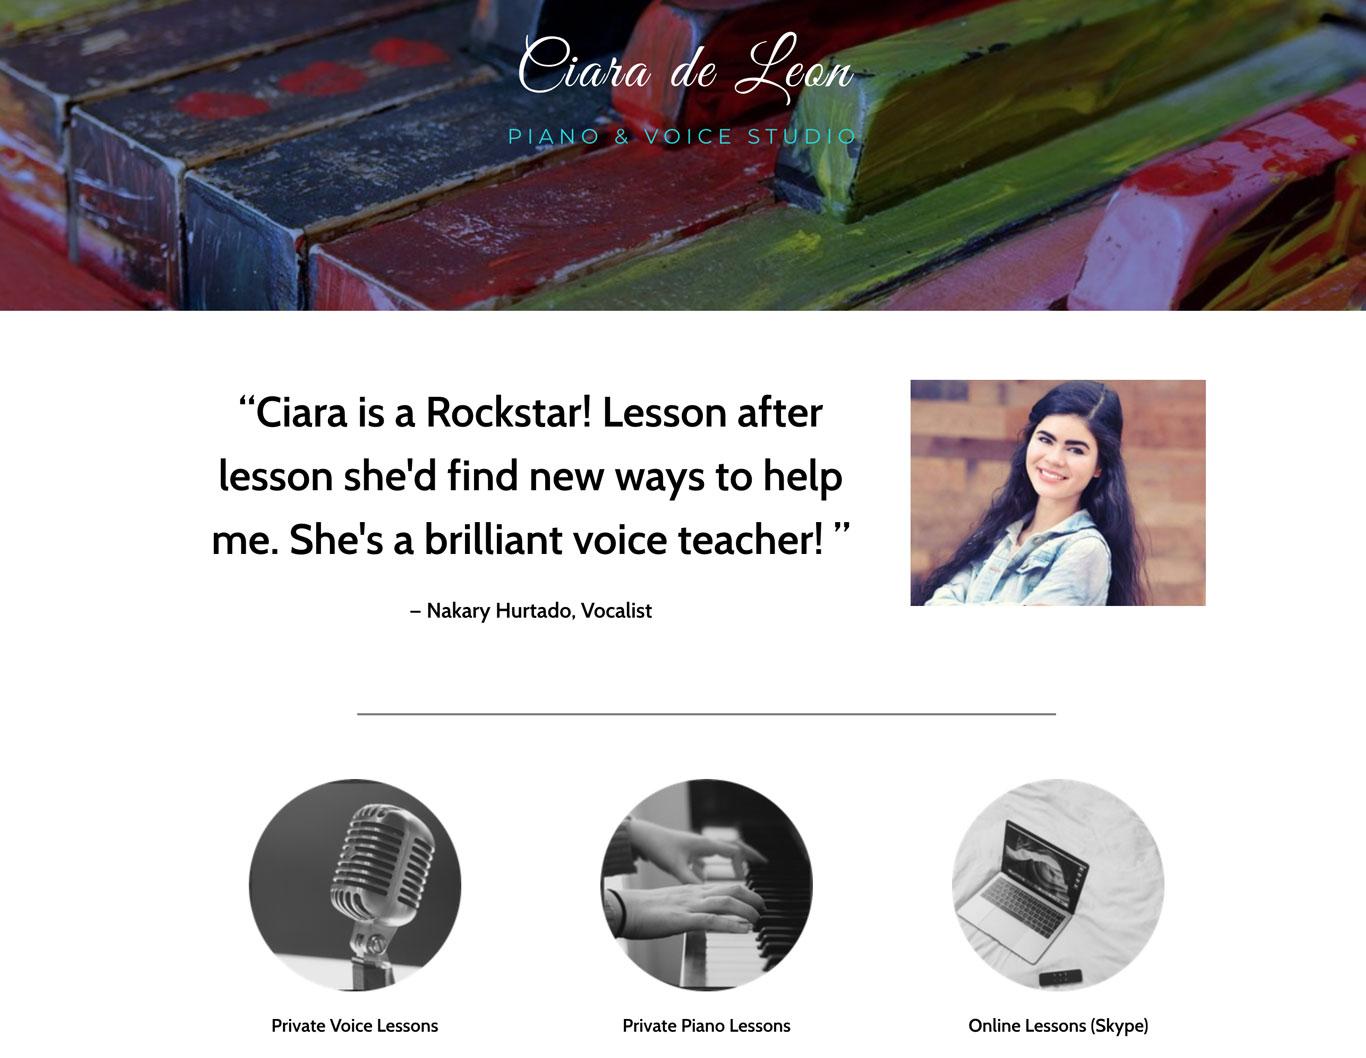 Music teacher website design example